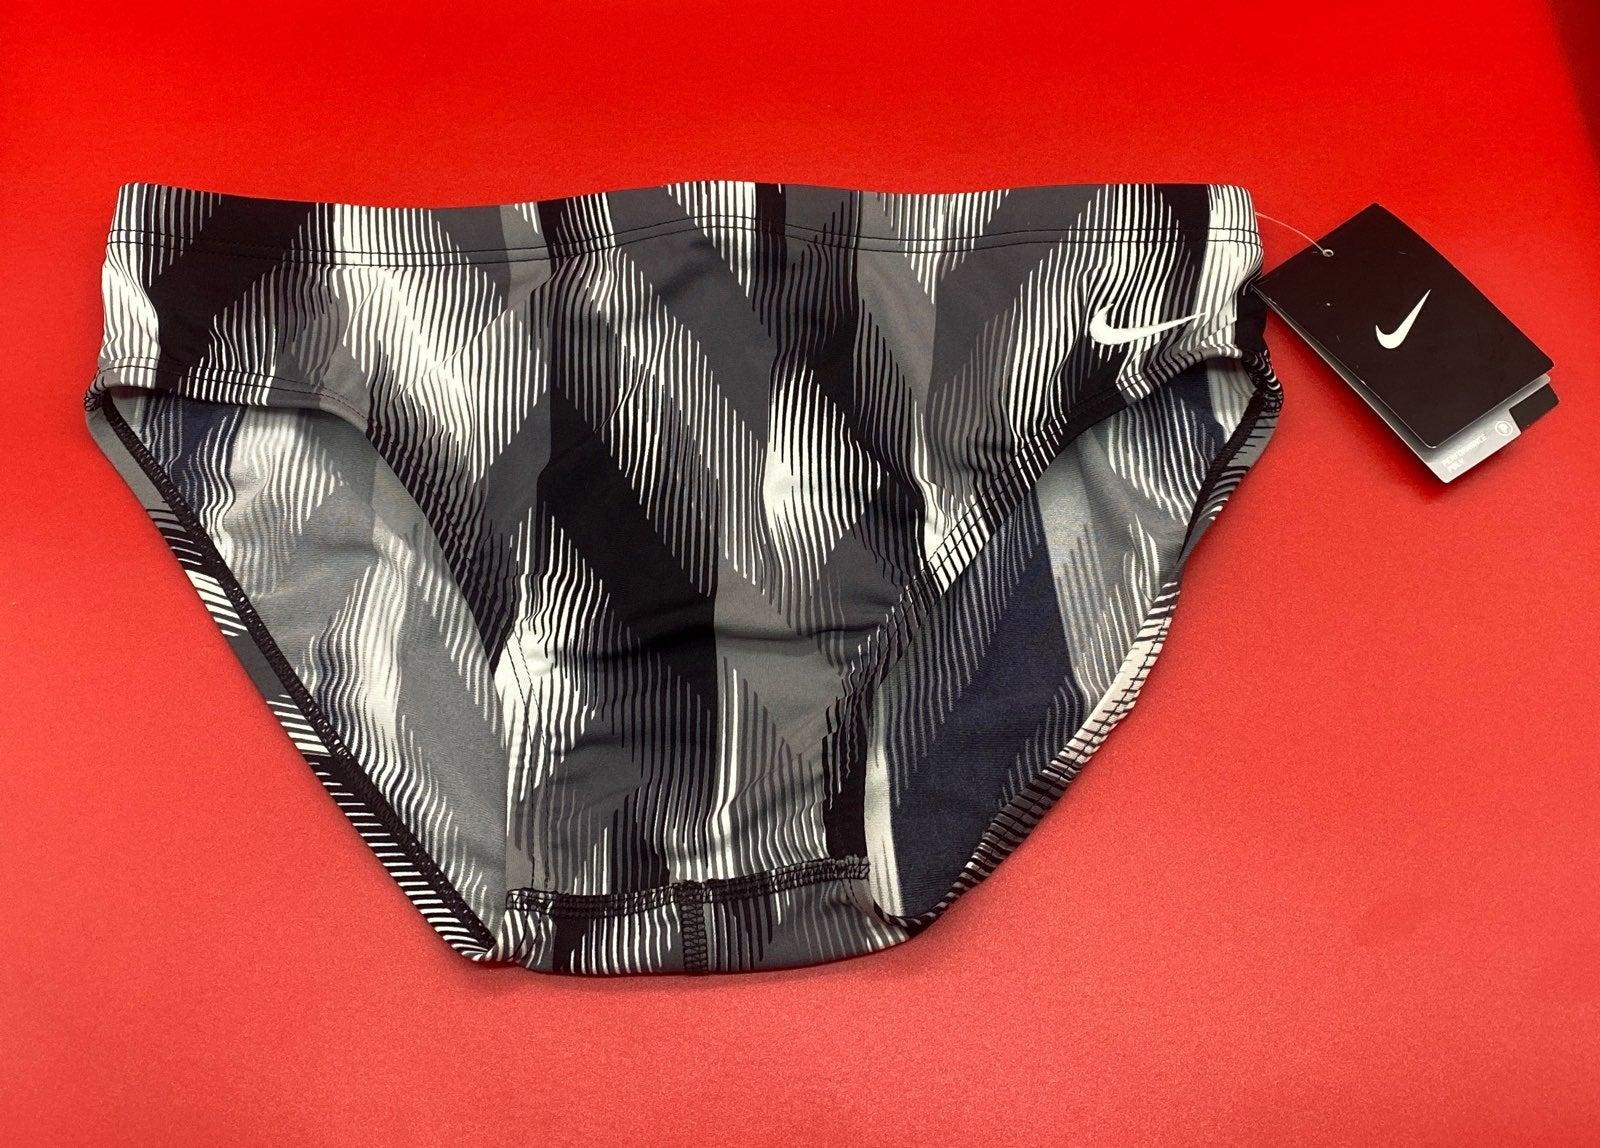 Nike swim brief sz 34 black/gray/white